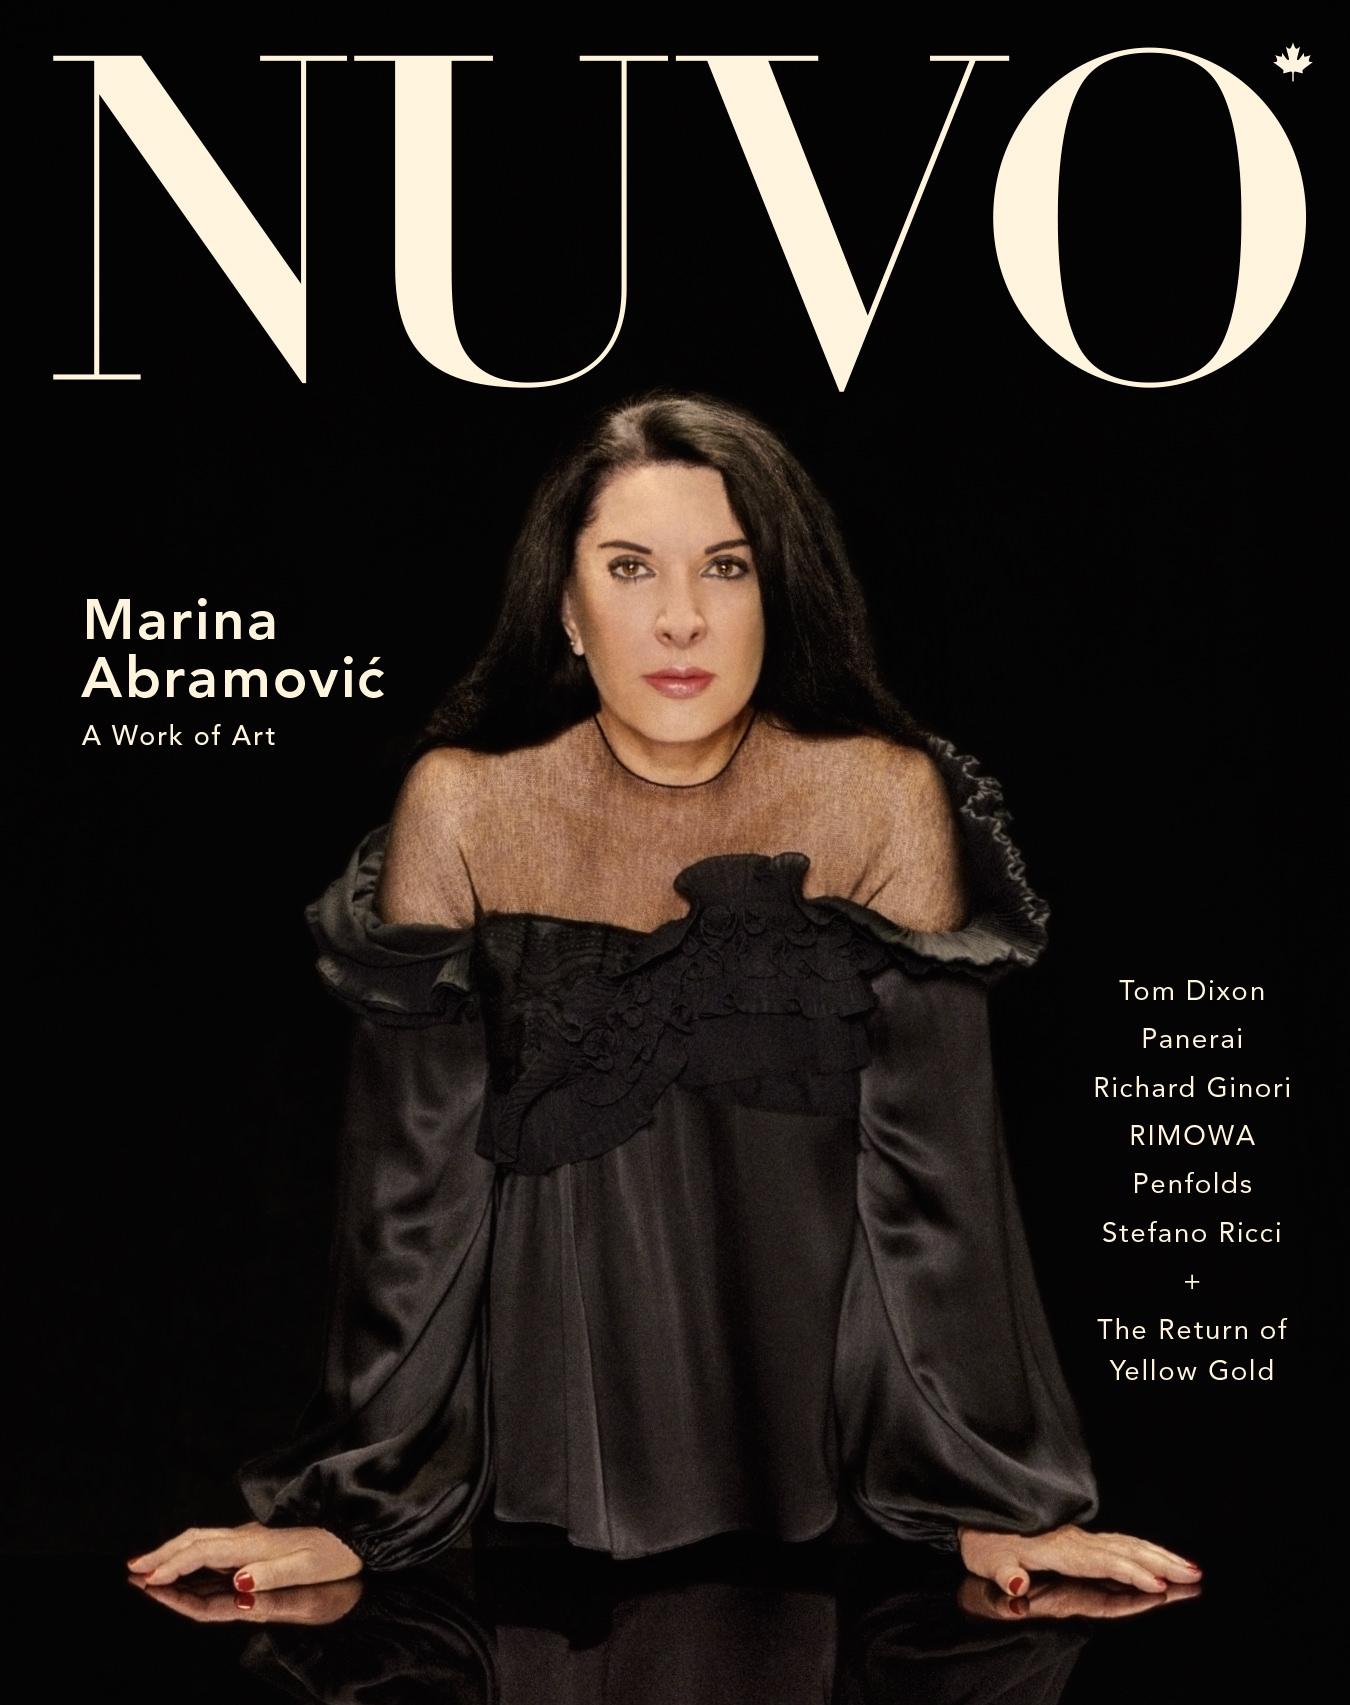 NUVO Winter 2016 cover